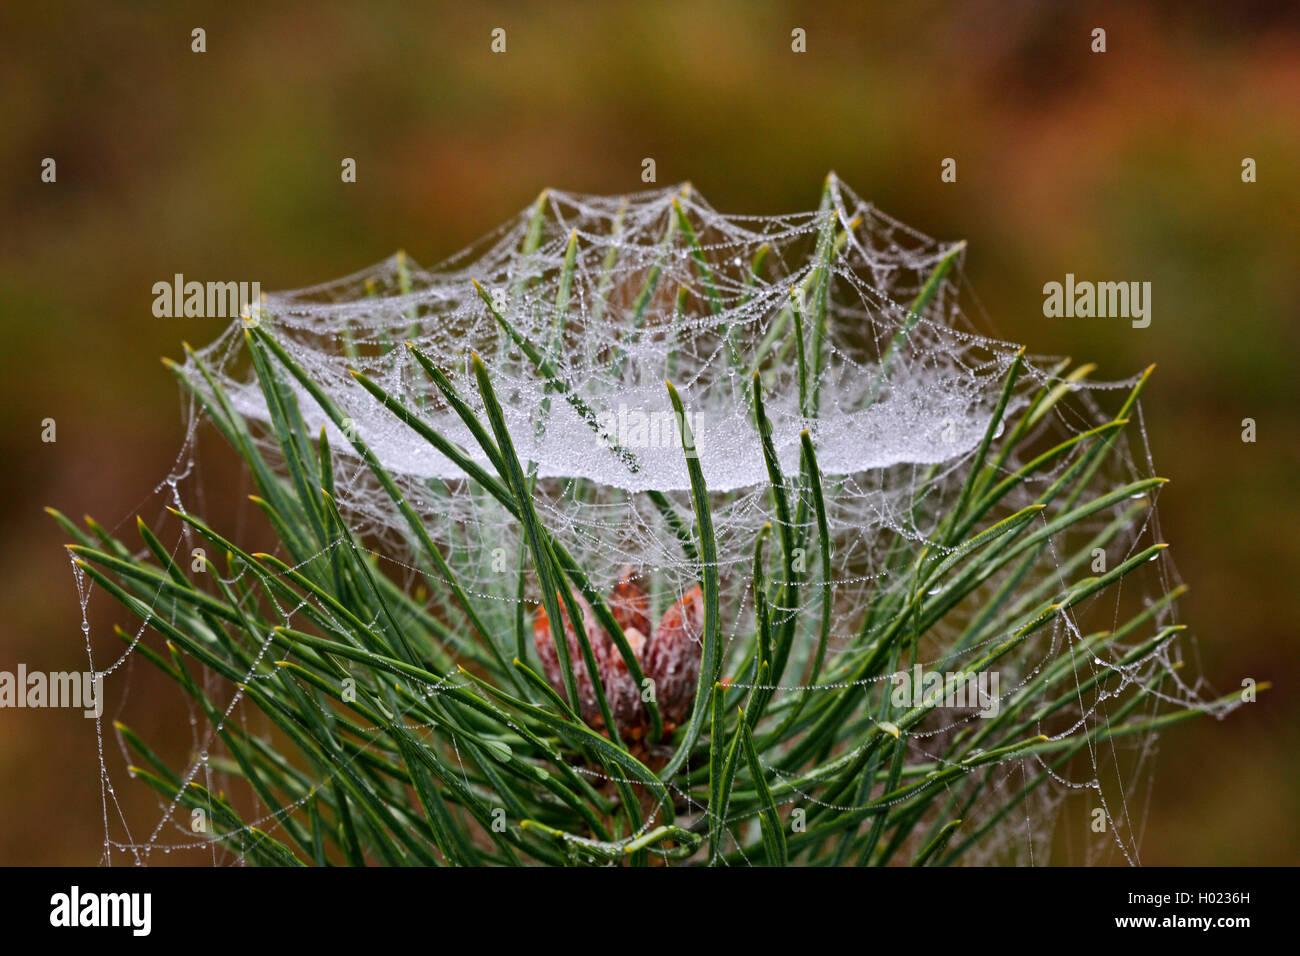 Baldachinspinne, Baldachin-Spinne, Frontinellina frutetorum (Frontinellina frutetorum, Frontinella frutetorum, Linyphia - Stock Image